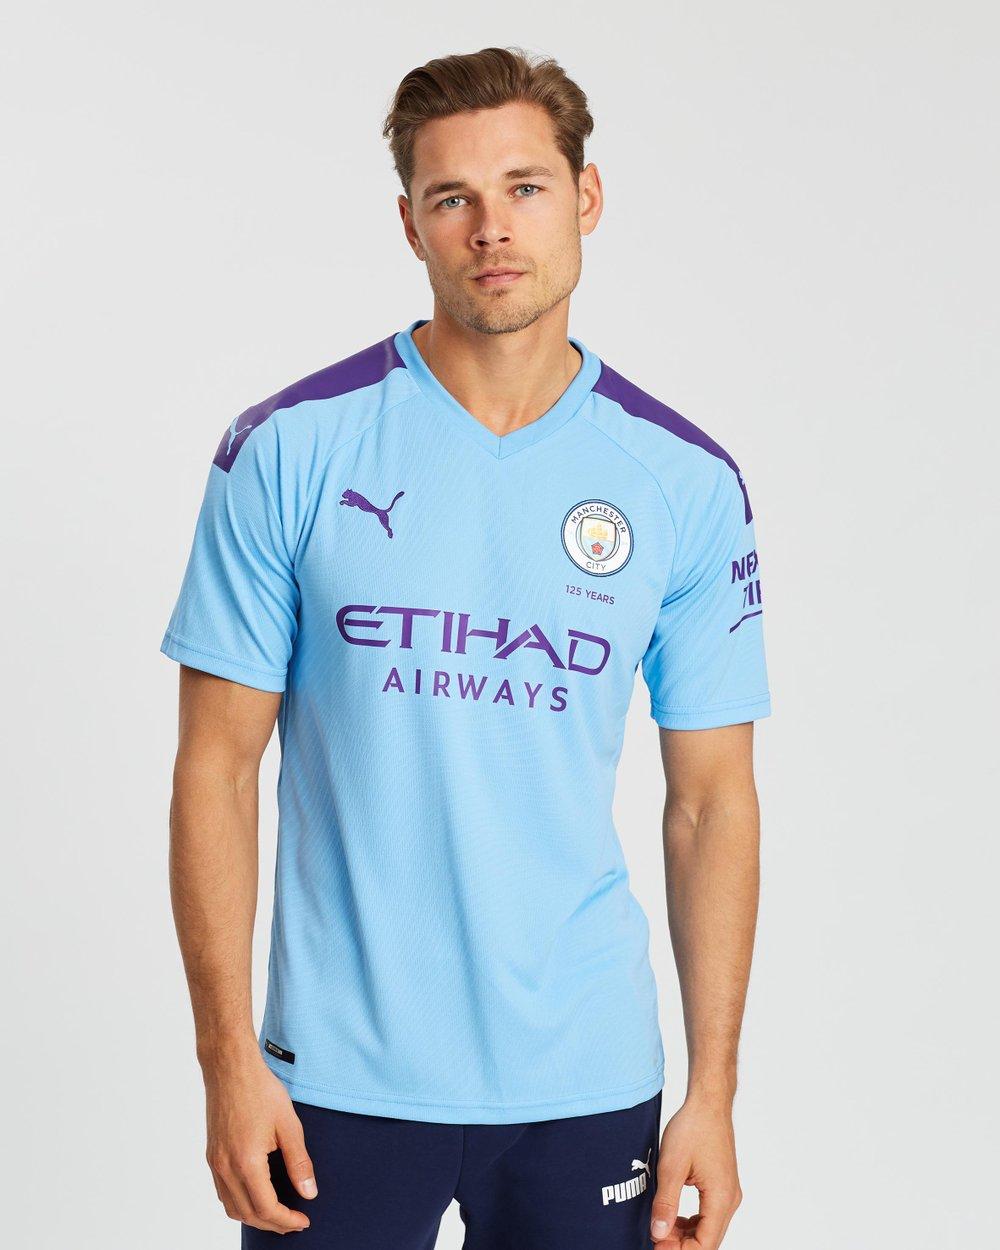 online retailer 10366 9ced6 Manchester City FC Home Replica Jersey